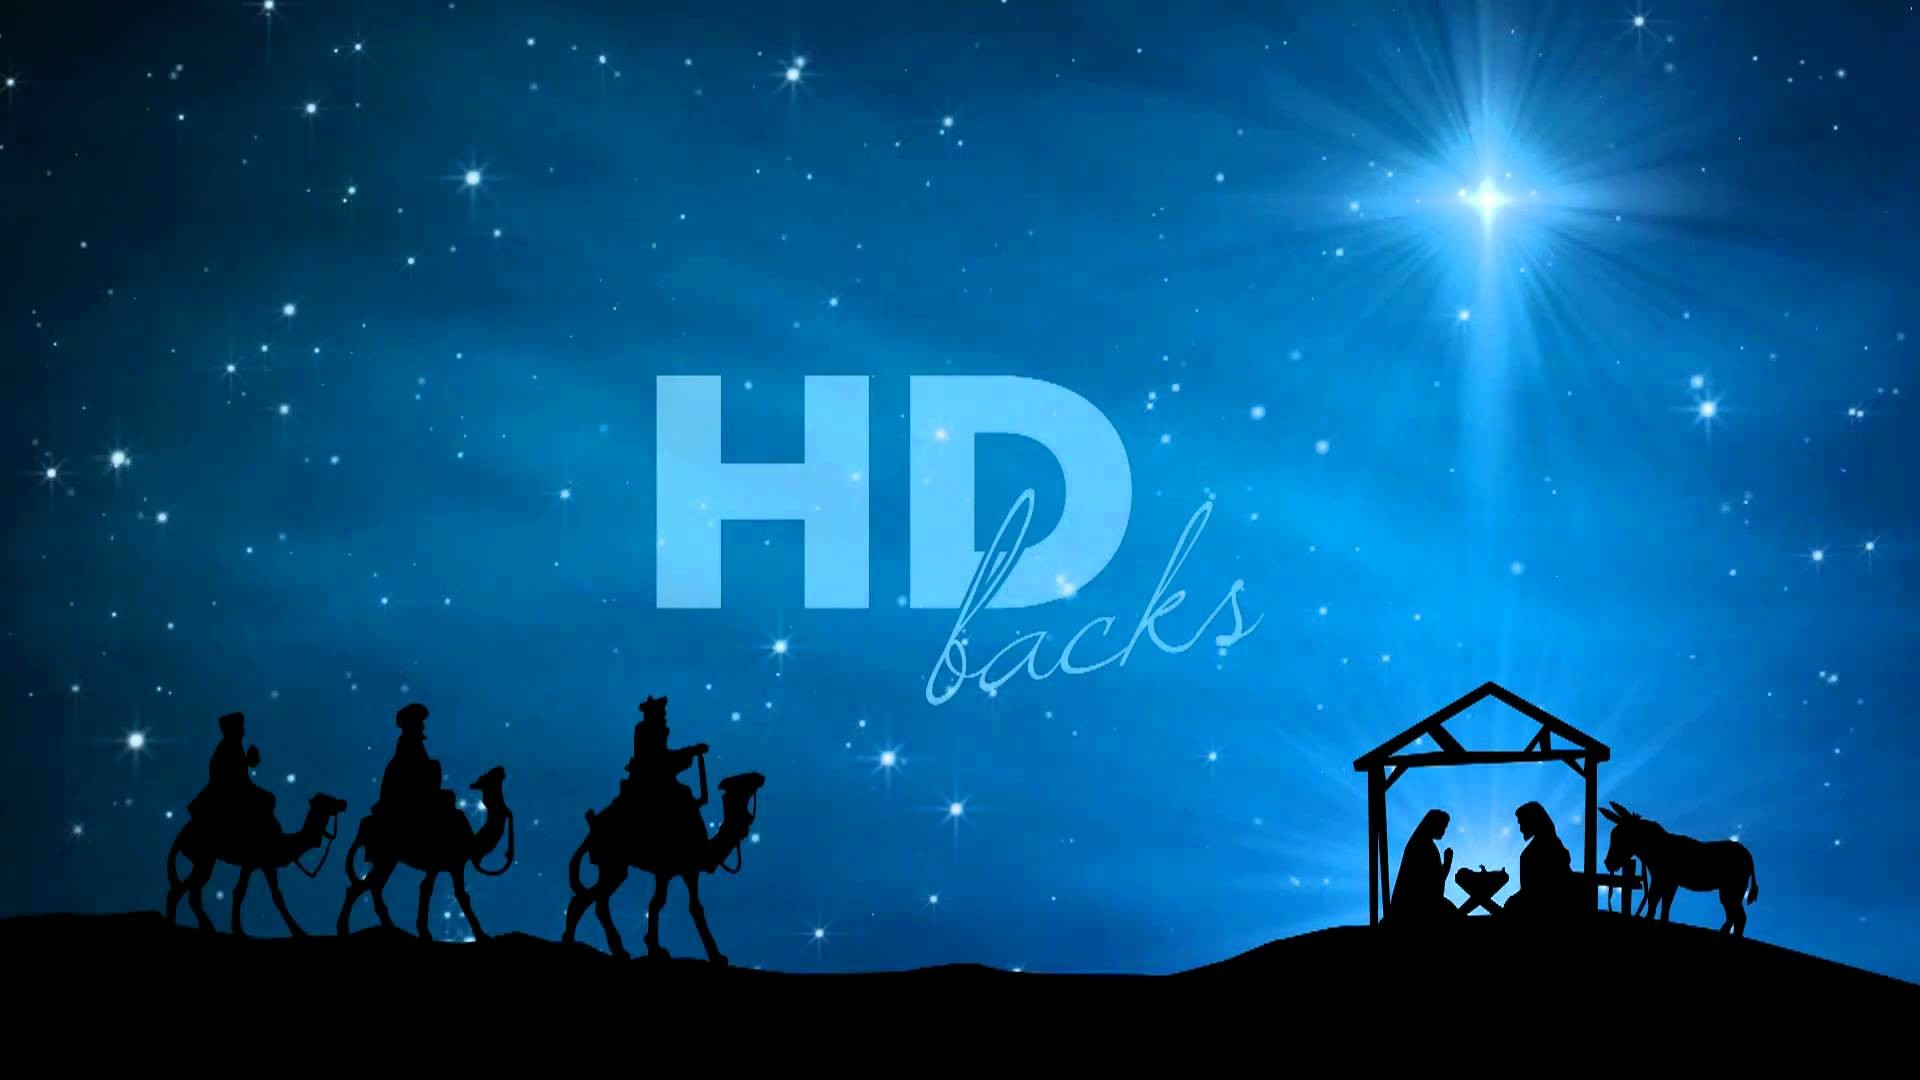 christmas nativity backgrounds free